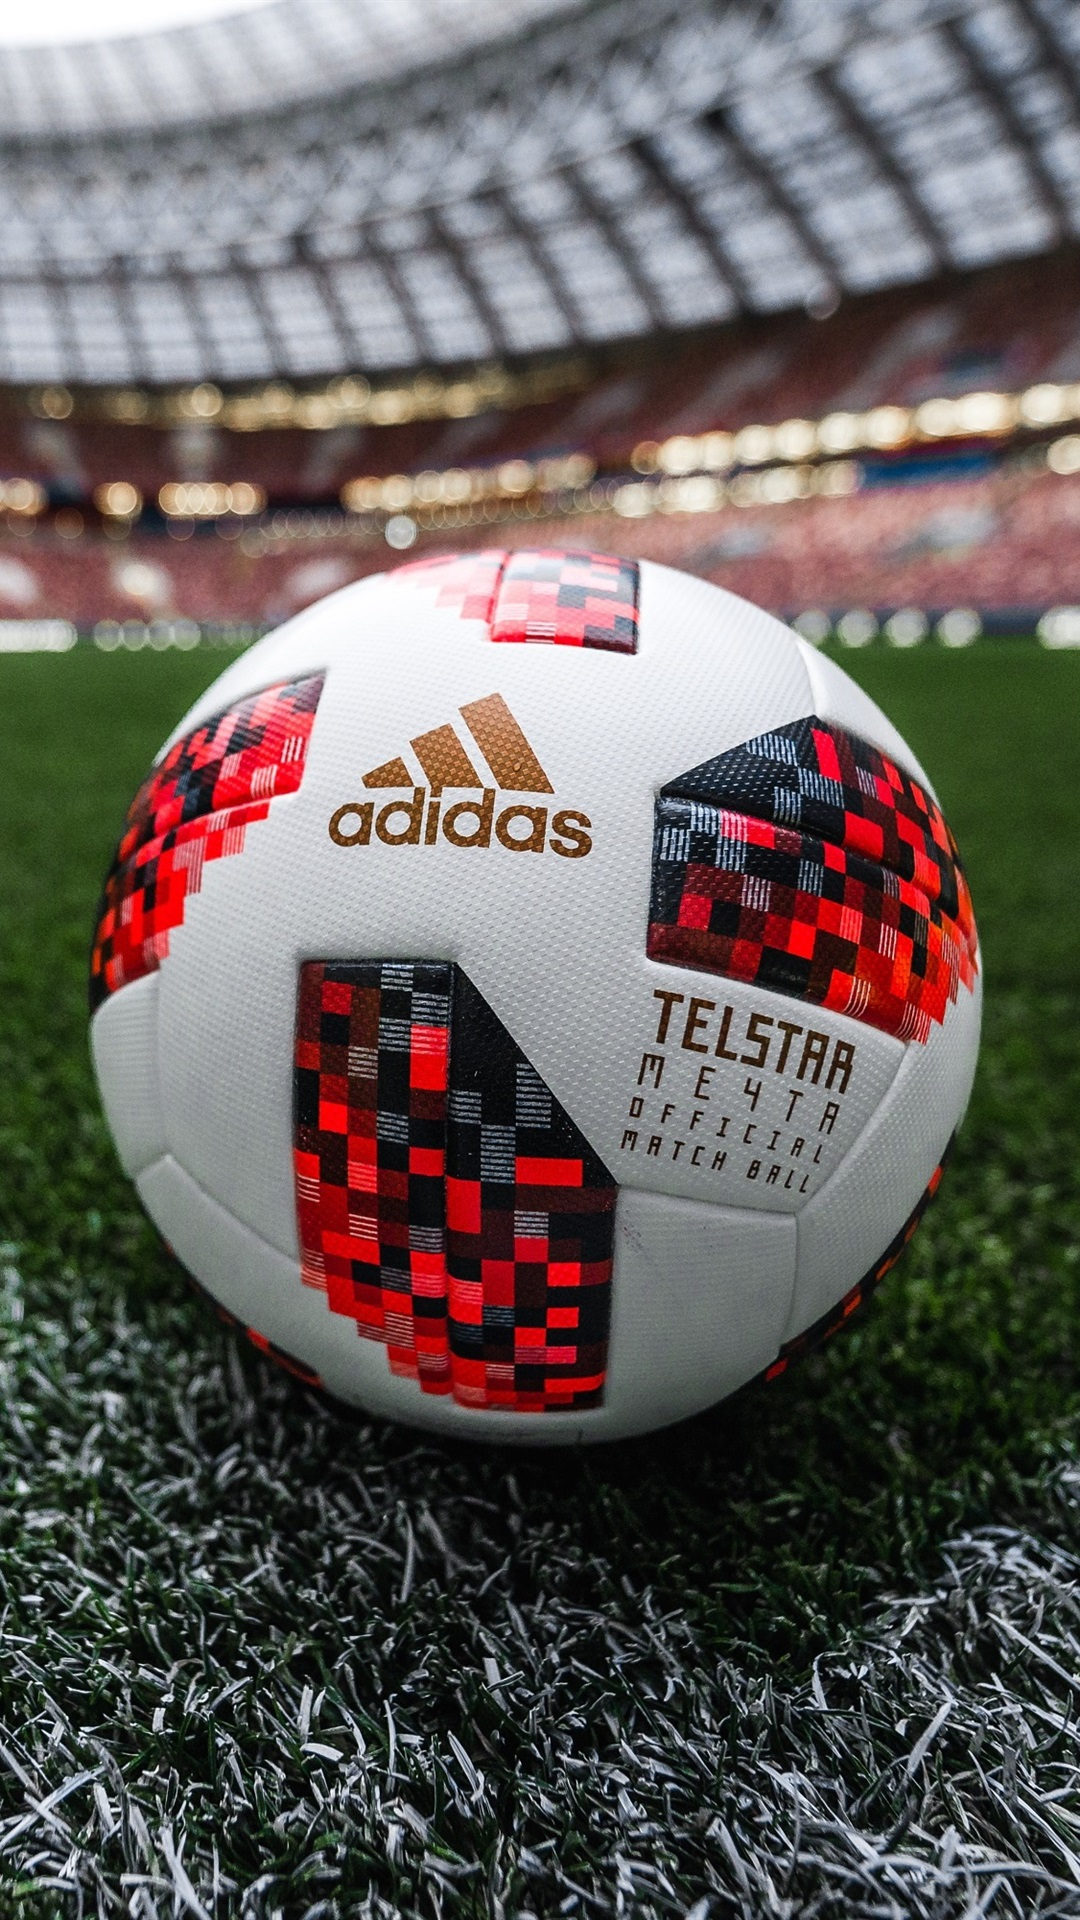 Fussball Russland Fifa Wm 2018 2880x1800 Hd